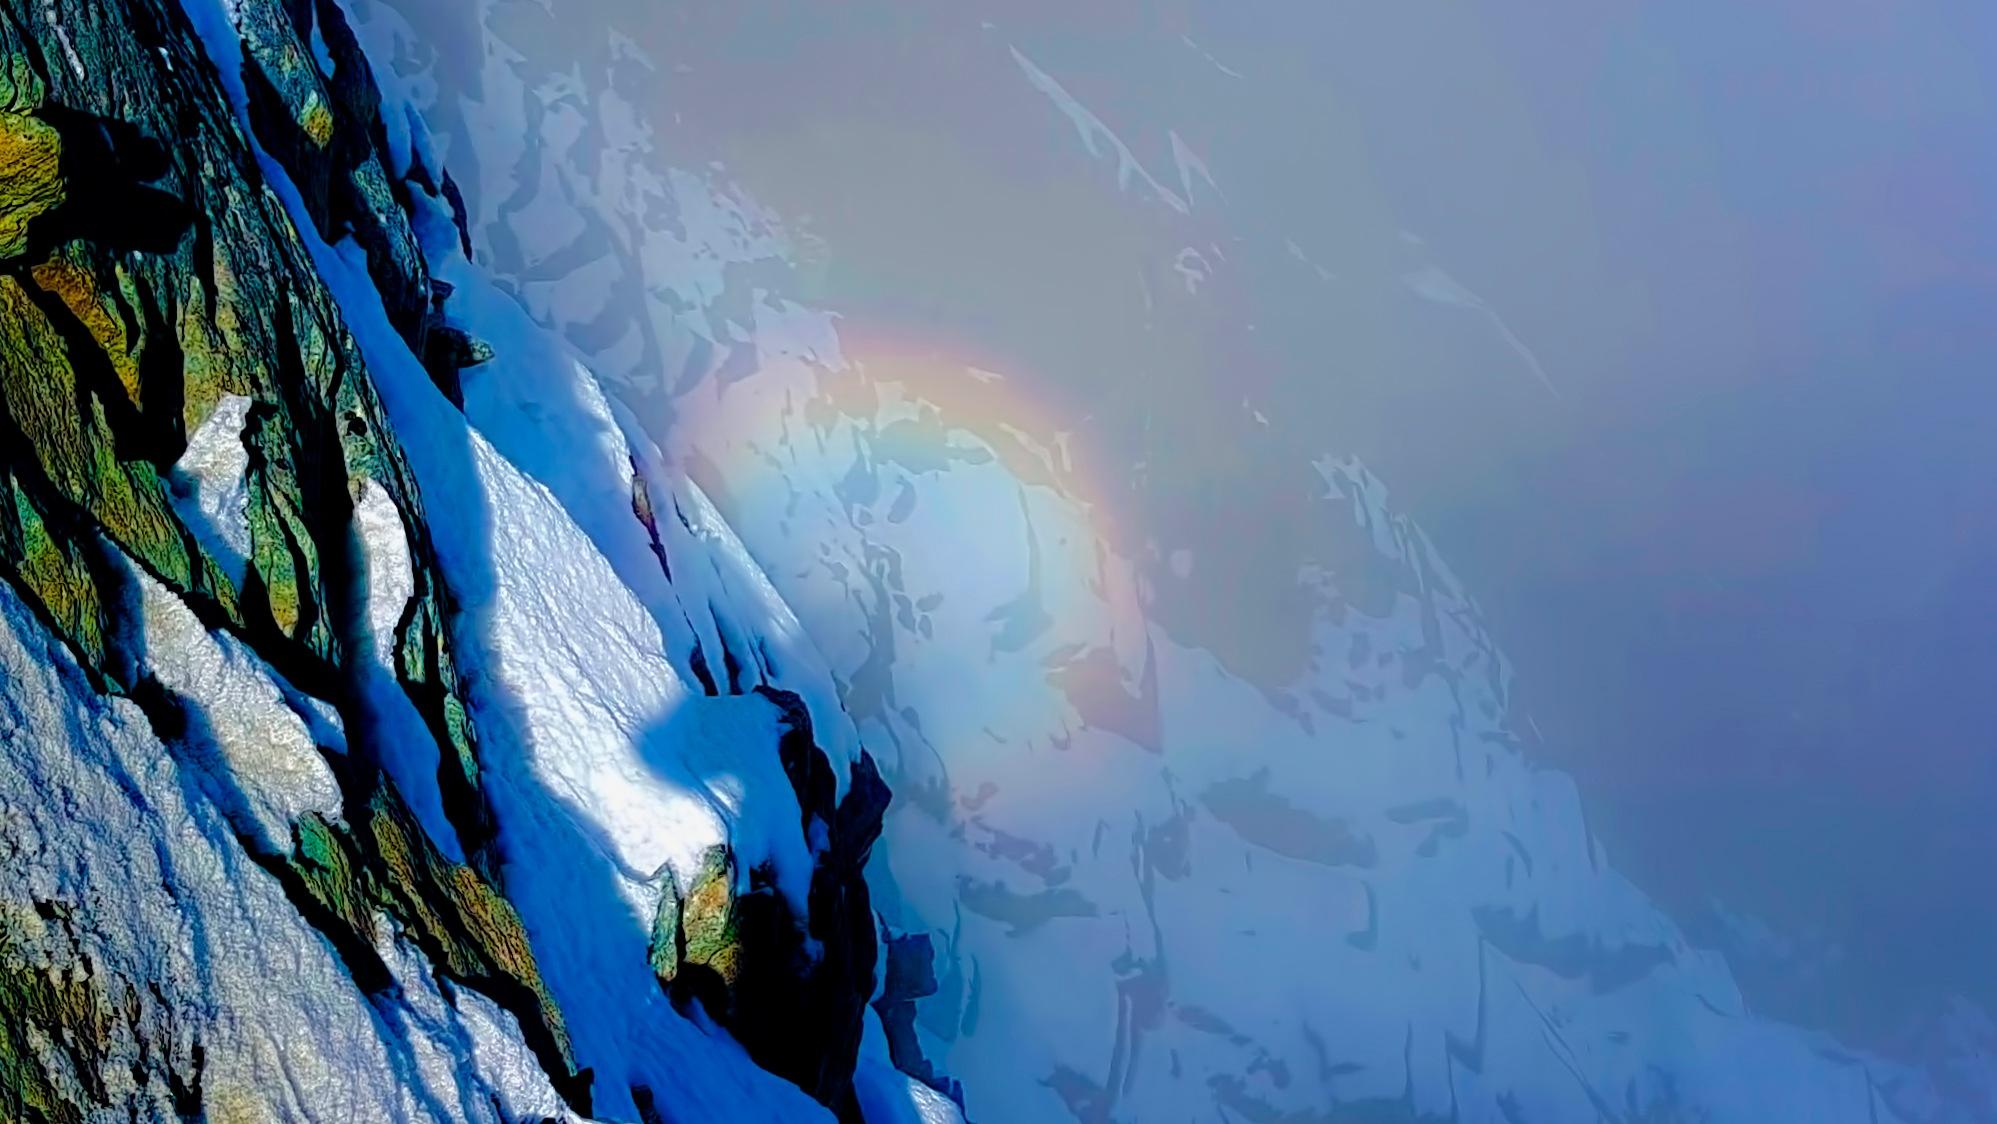 Mountain glory by Bojan Pintar